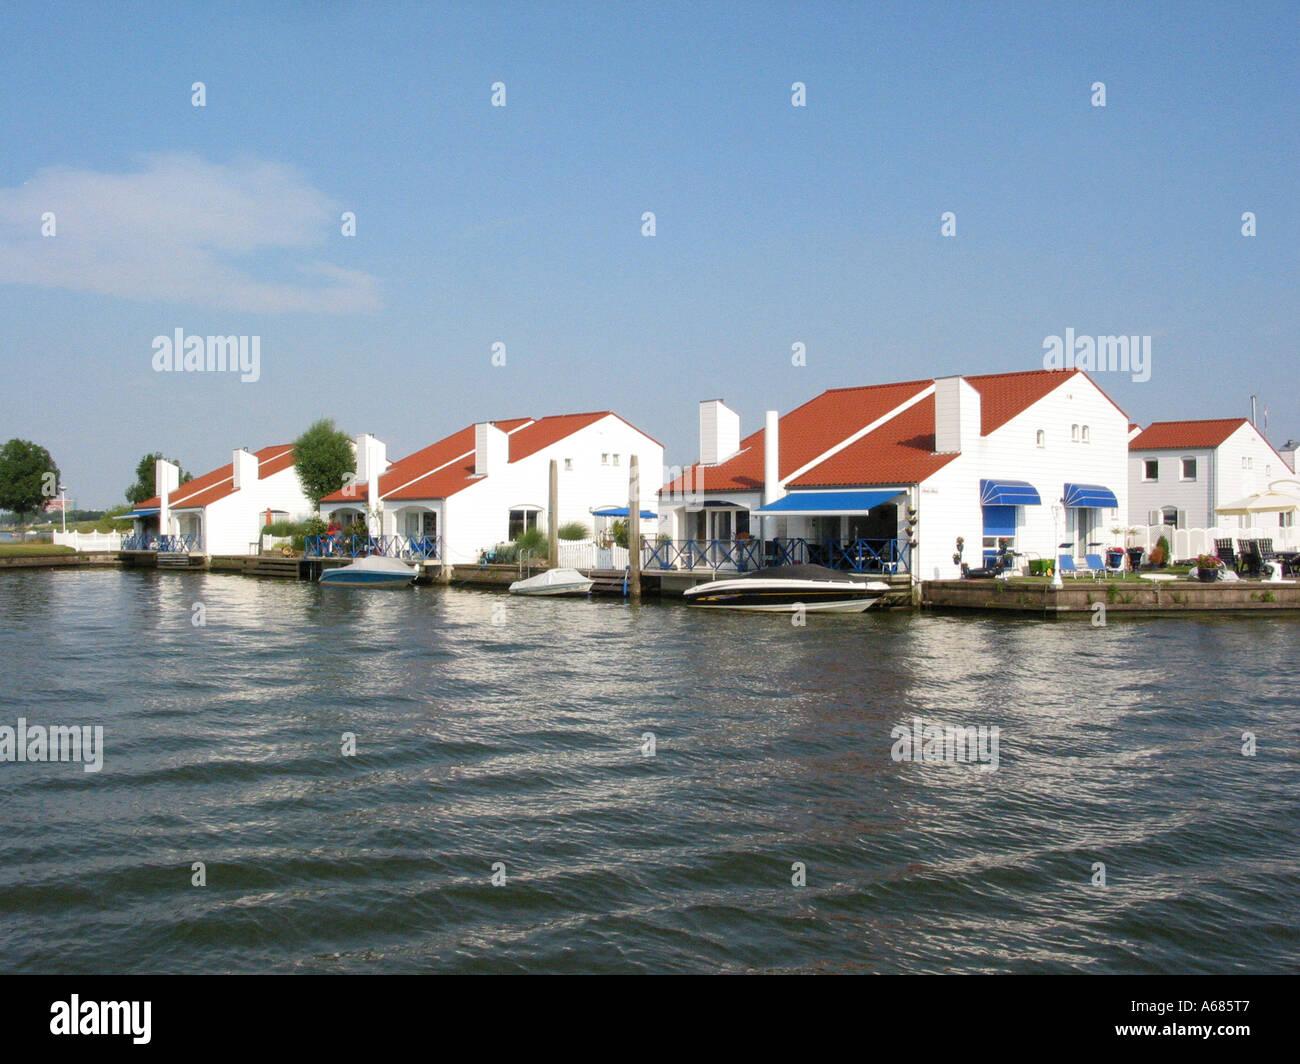 Outstanding Marina Oolderhuuske Resort With Floating Homes Built On Download Free Architecture Designs Intelgarnamadebymaigaardcom